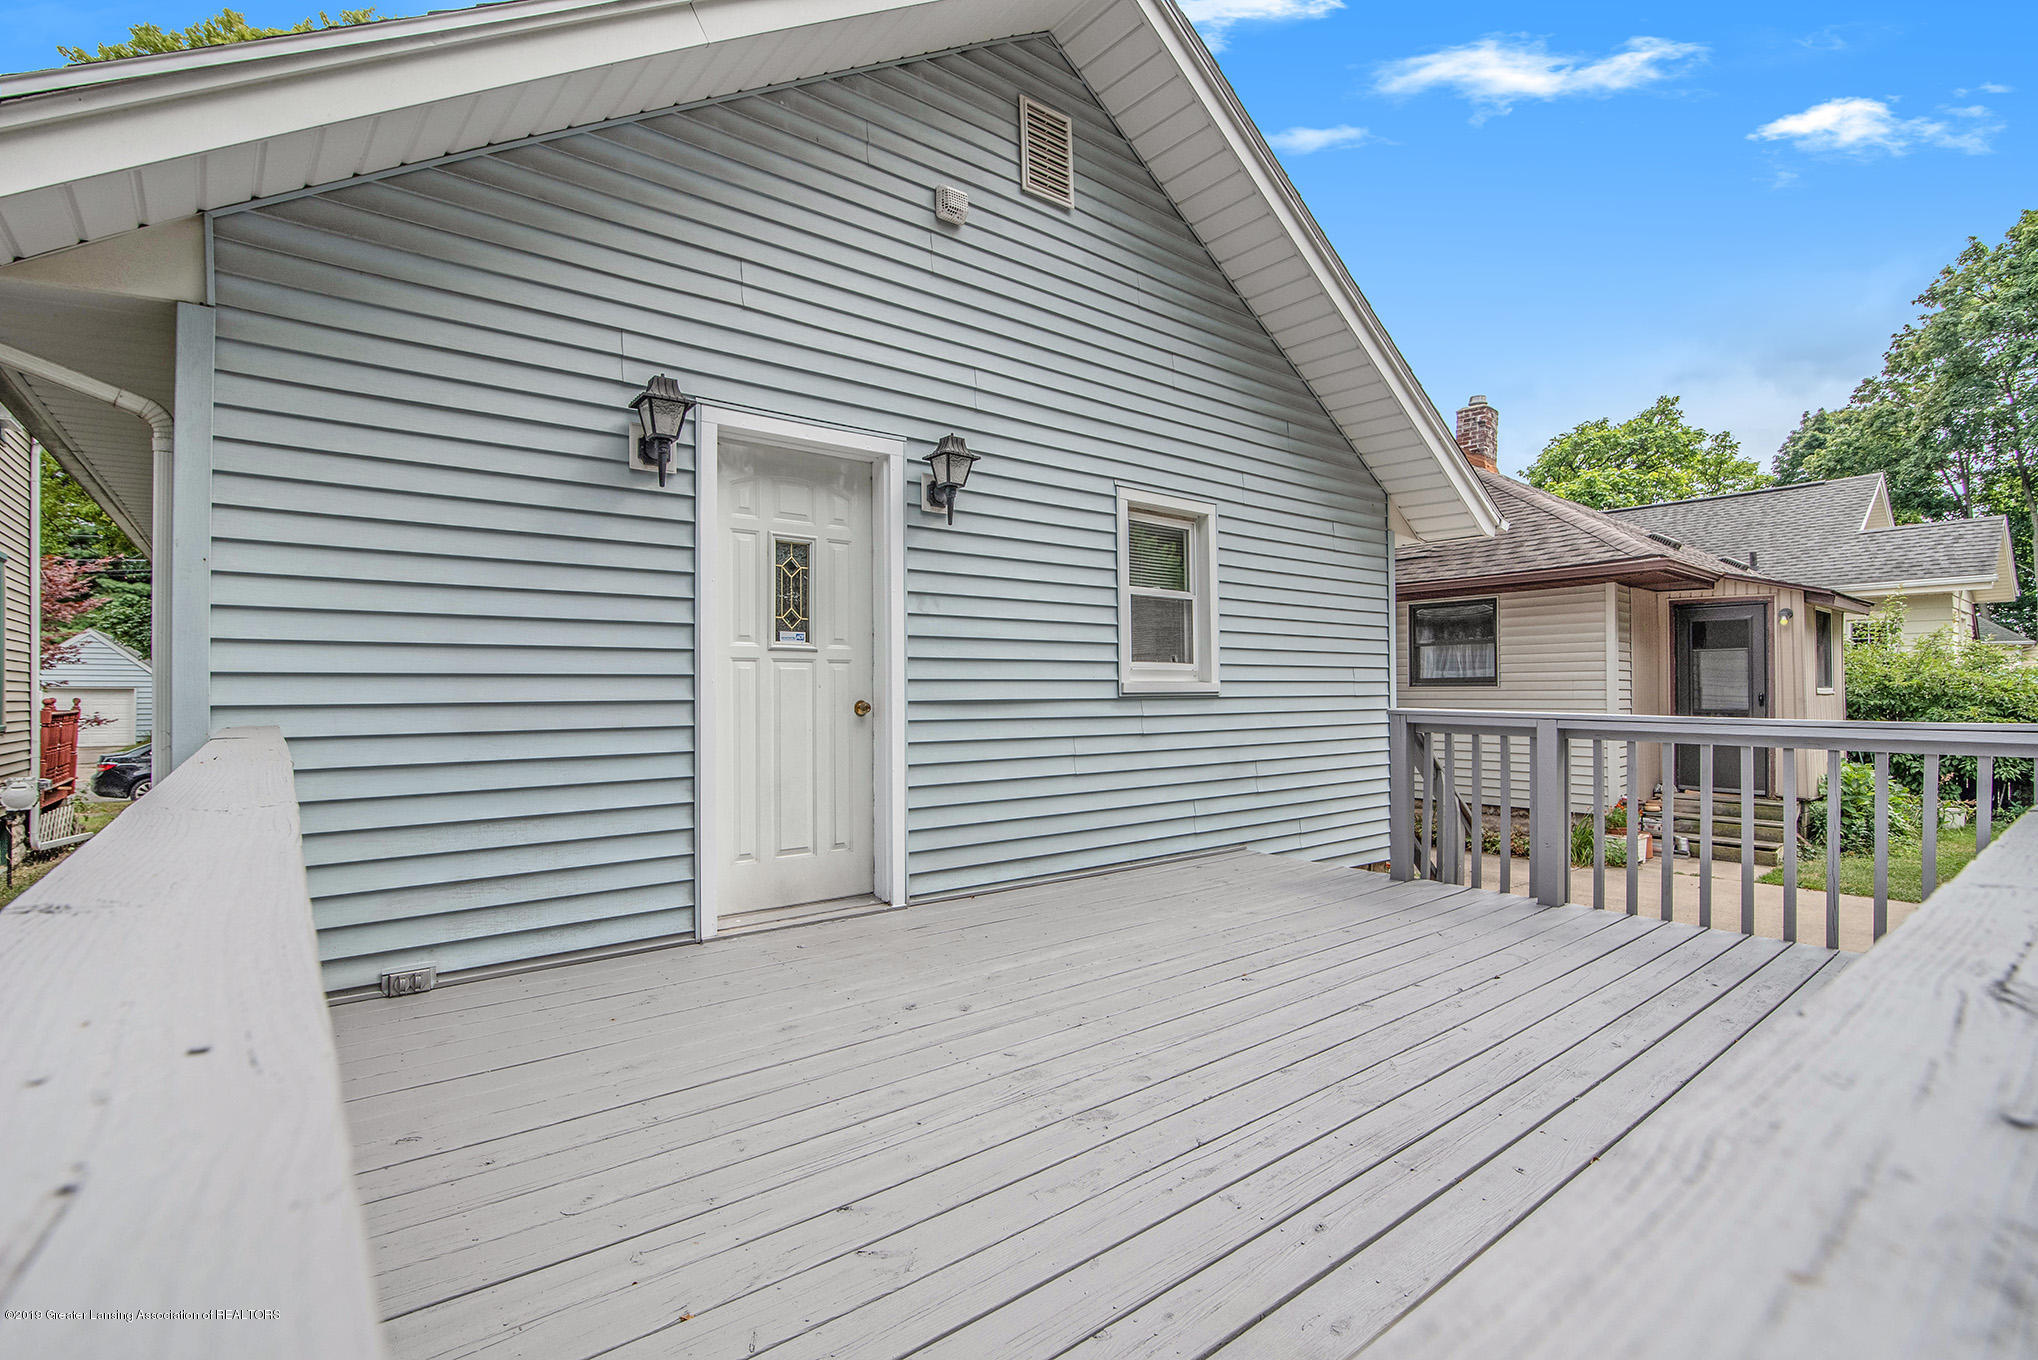 319 N Hayford Ave - 17 deck - 17